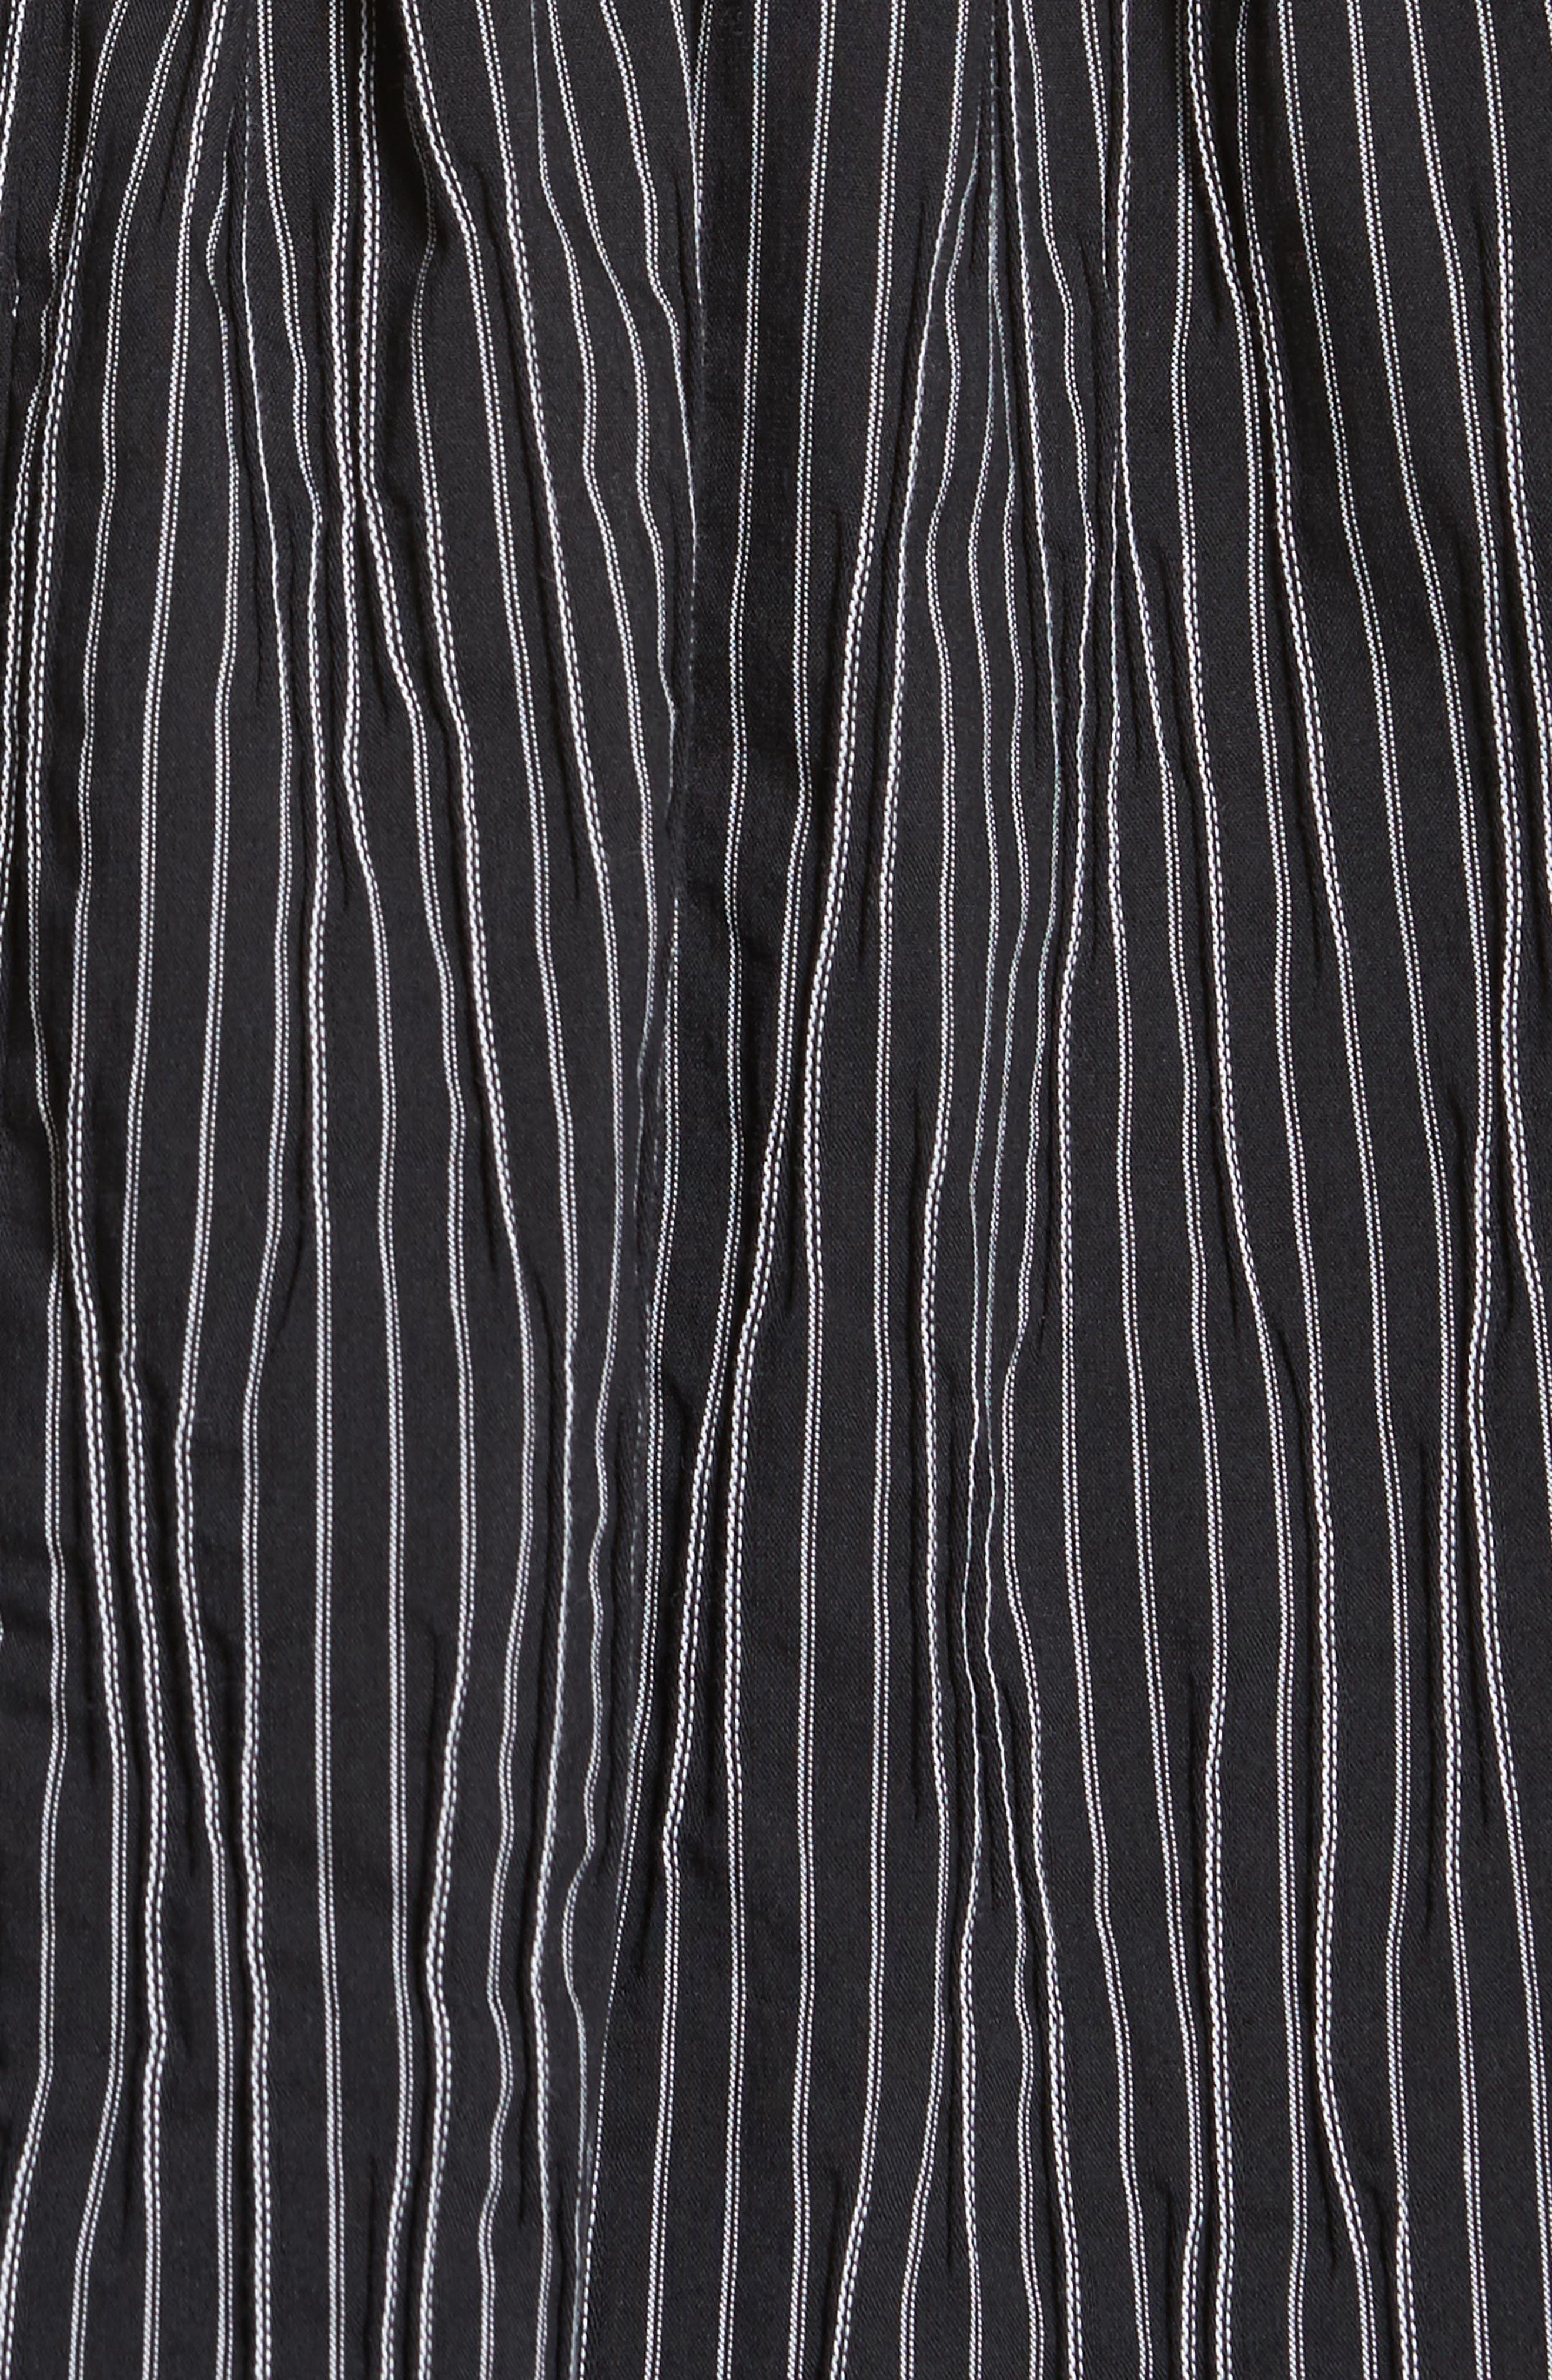 Stripe Crinkle Cotton Blend Swing Top,                             Alternate thumbnail 5, color,                             Black/ White Stripe